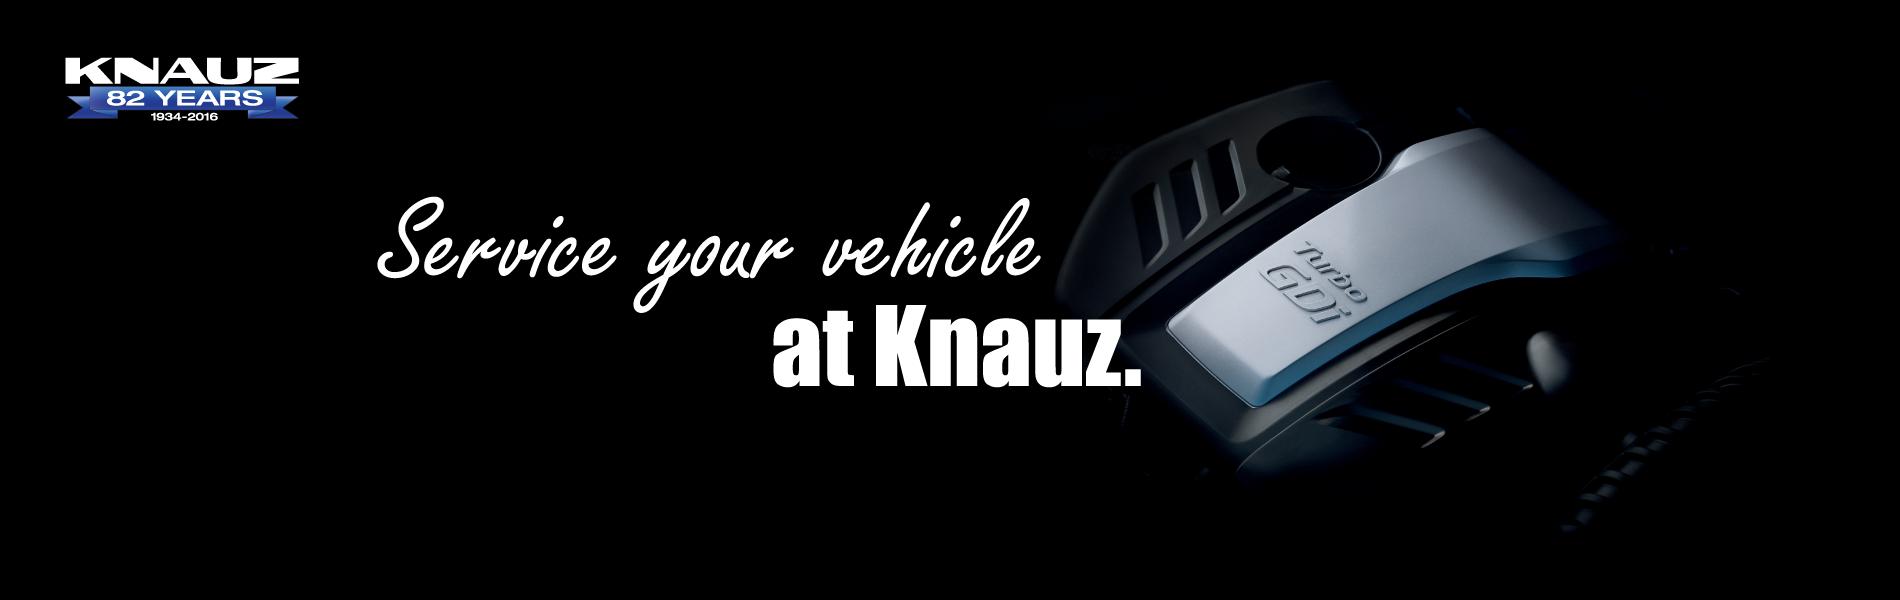 Knauz Service